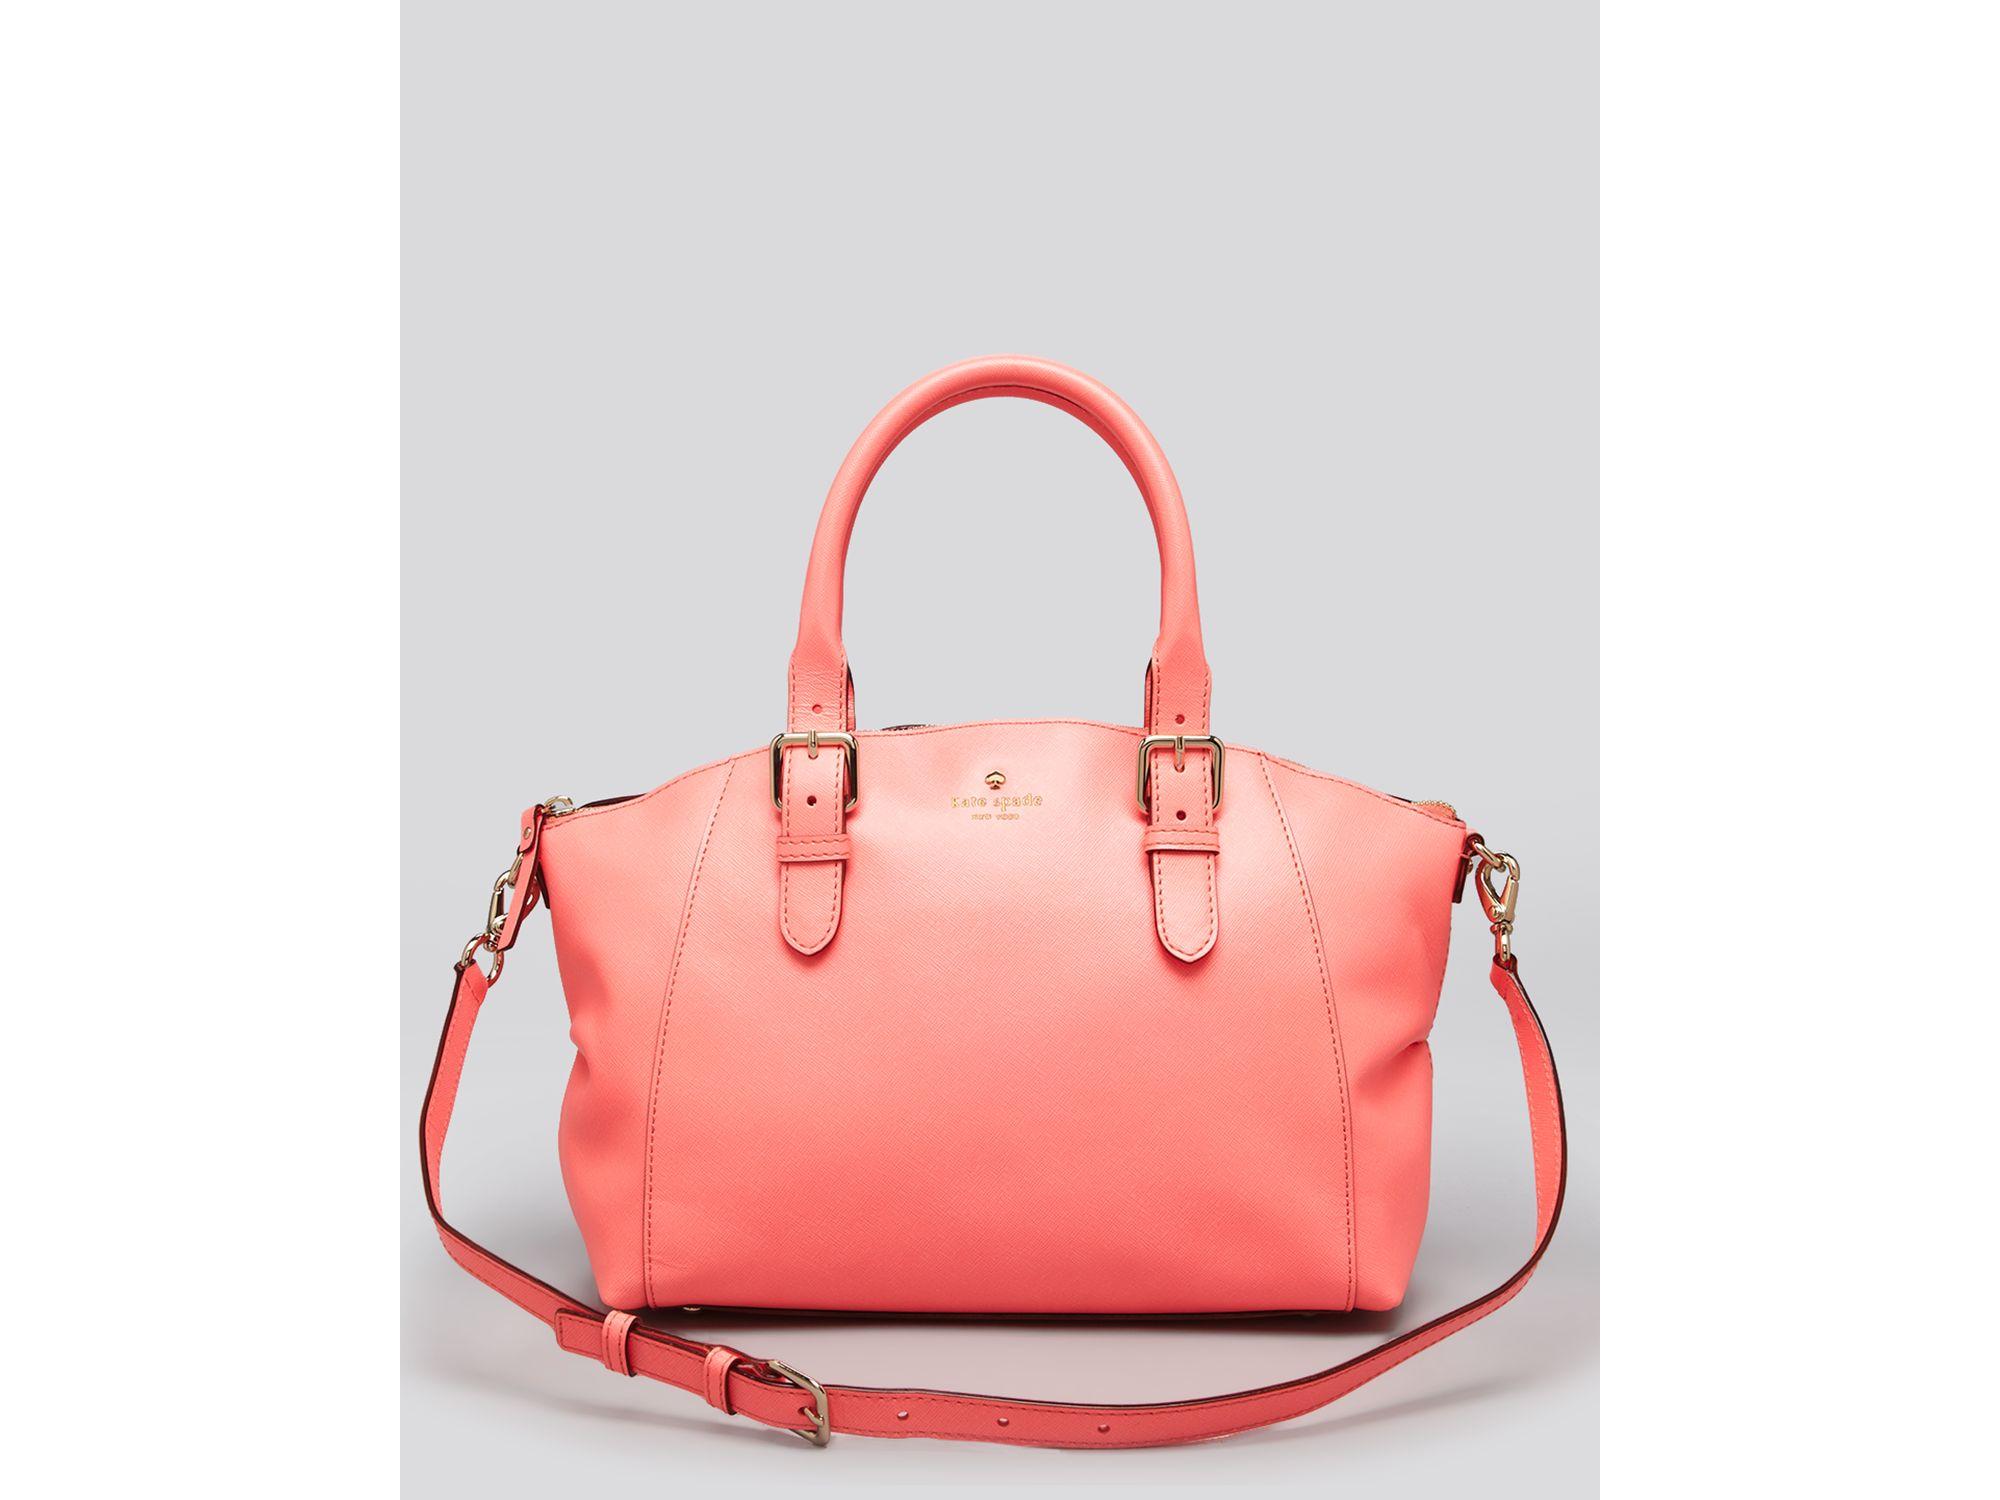 Lyst - Kate Spade Satchel Charlotte Street Small Sloan in Pink fa6fe8246cf53